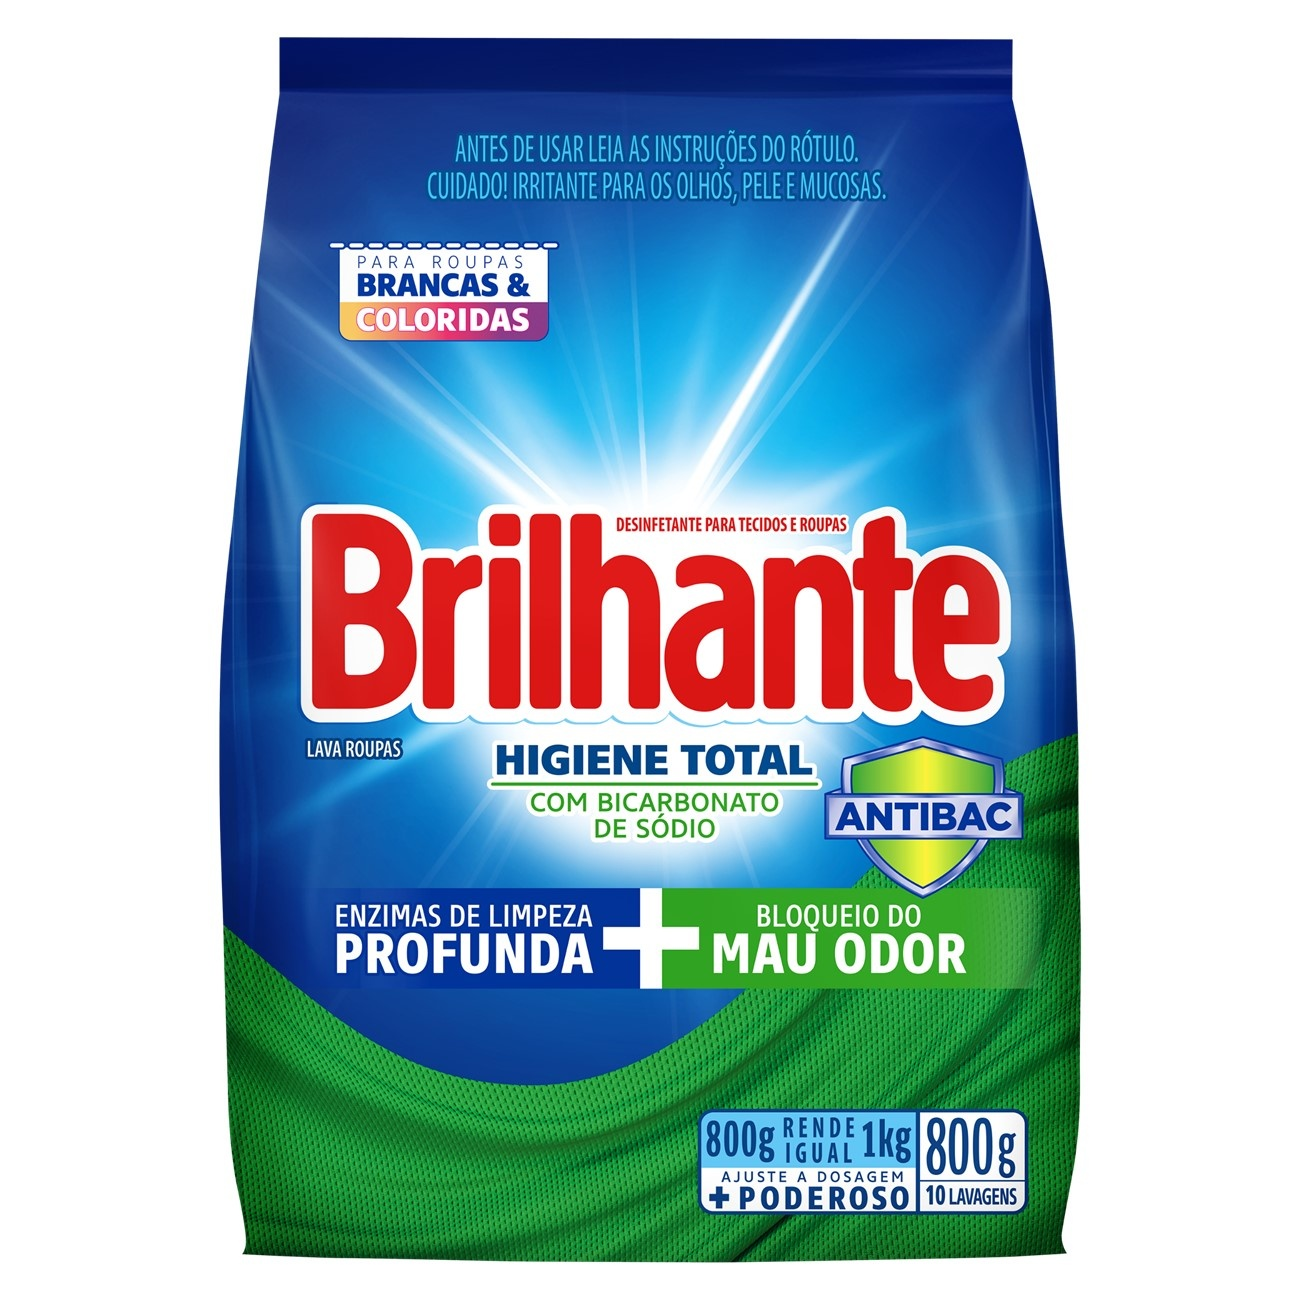 BRILHANTE PO HIG TOT ANTIBAC BAG 800G(16